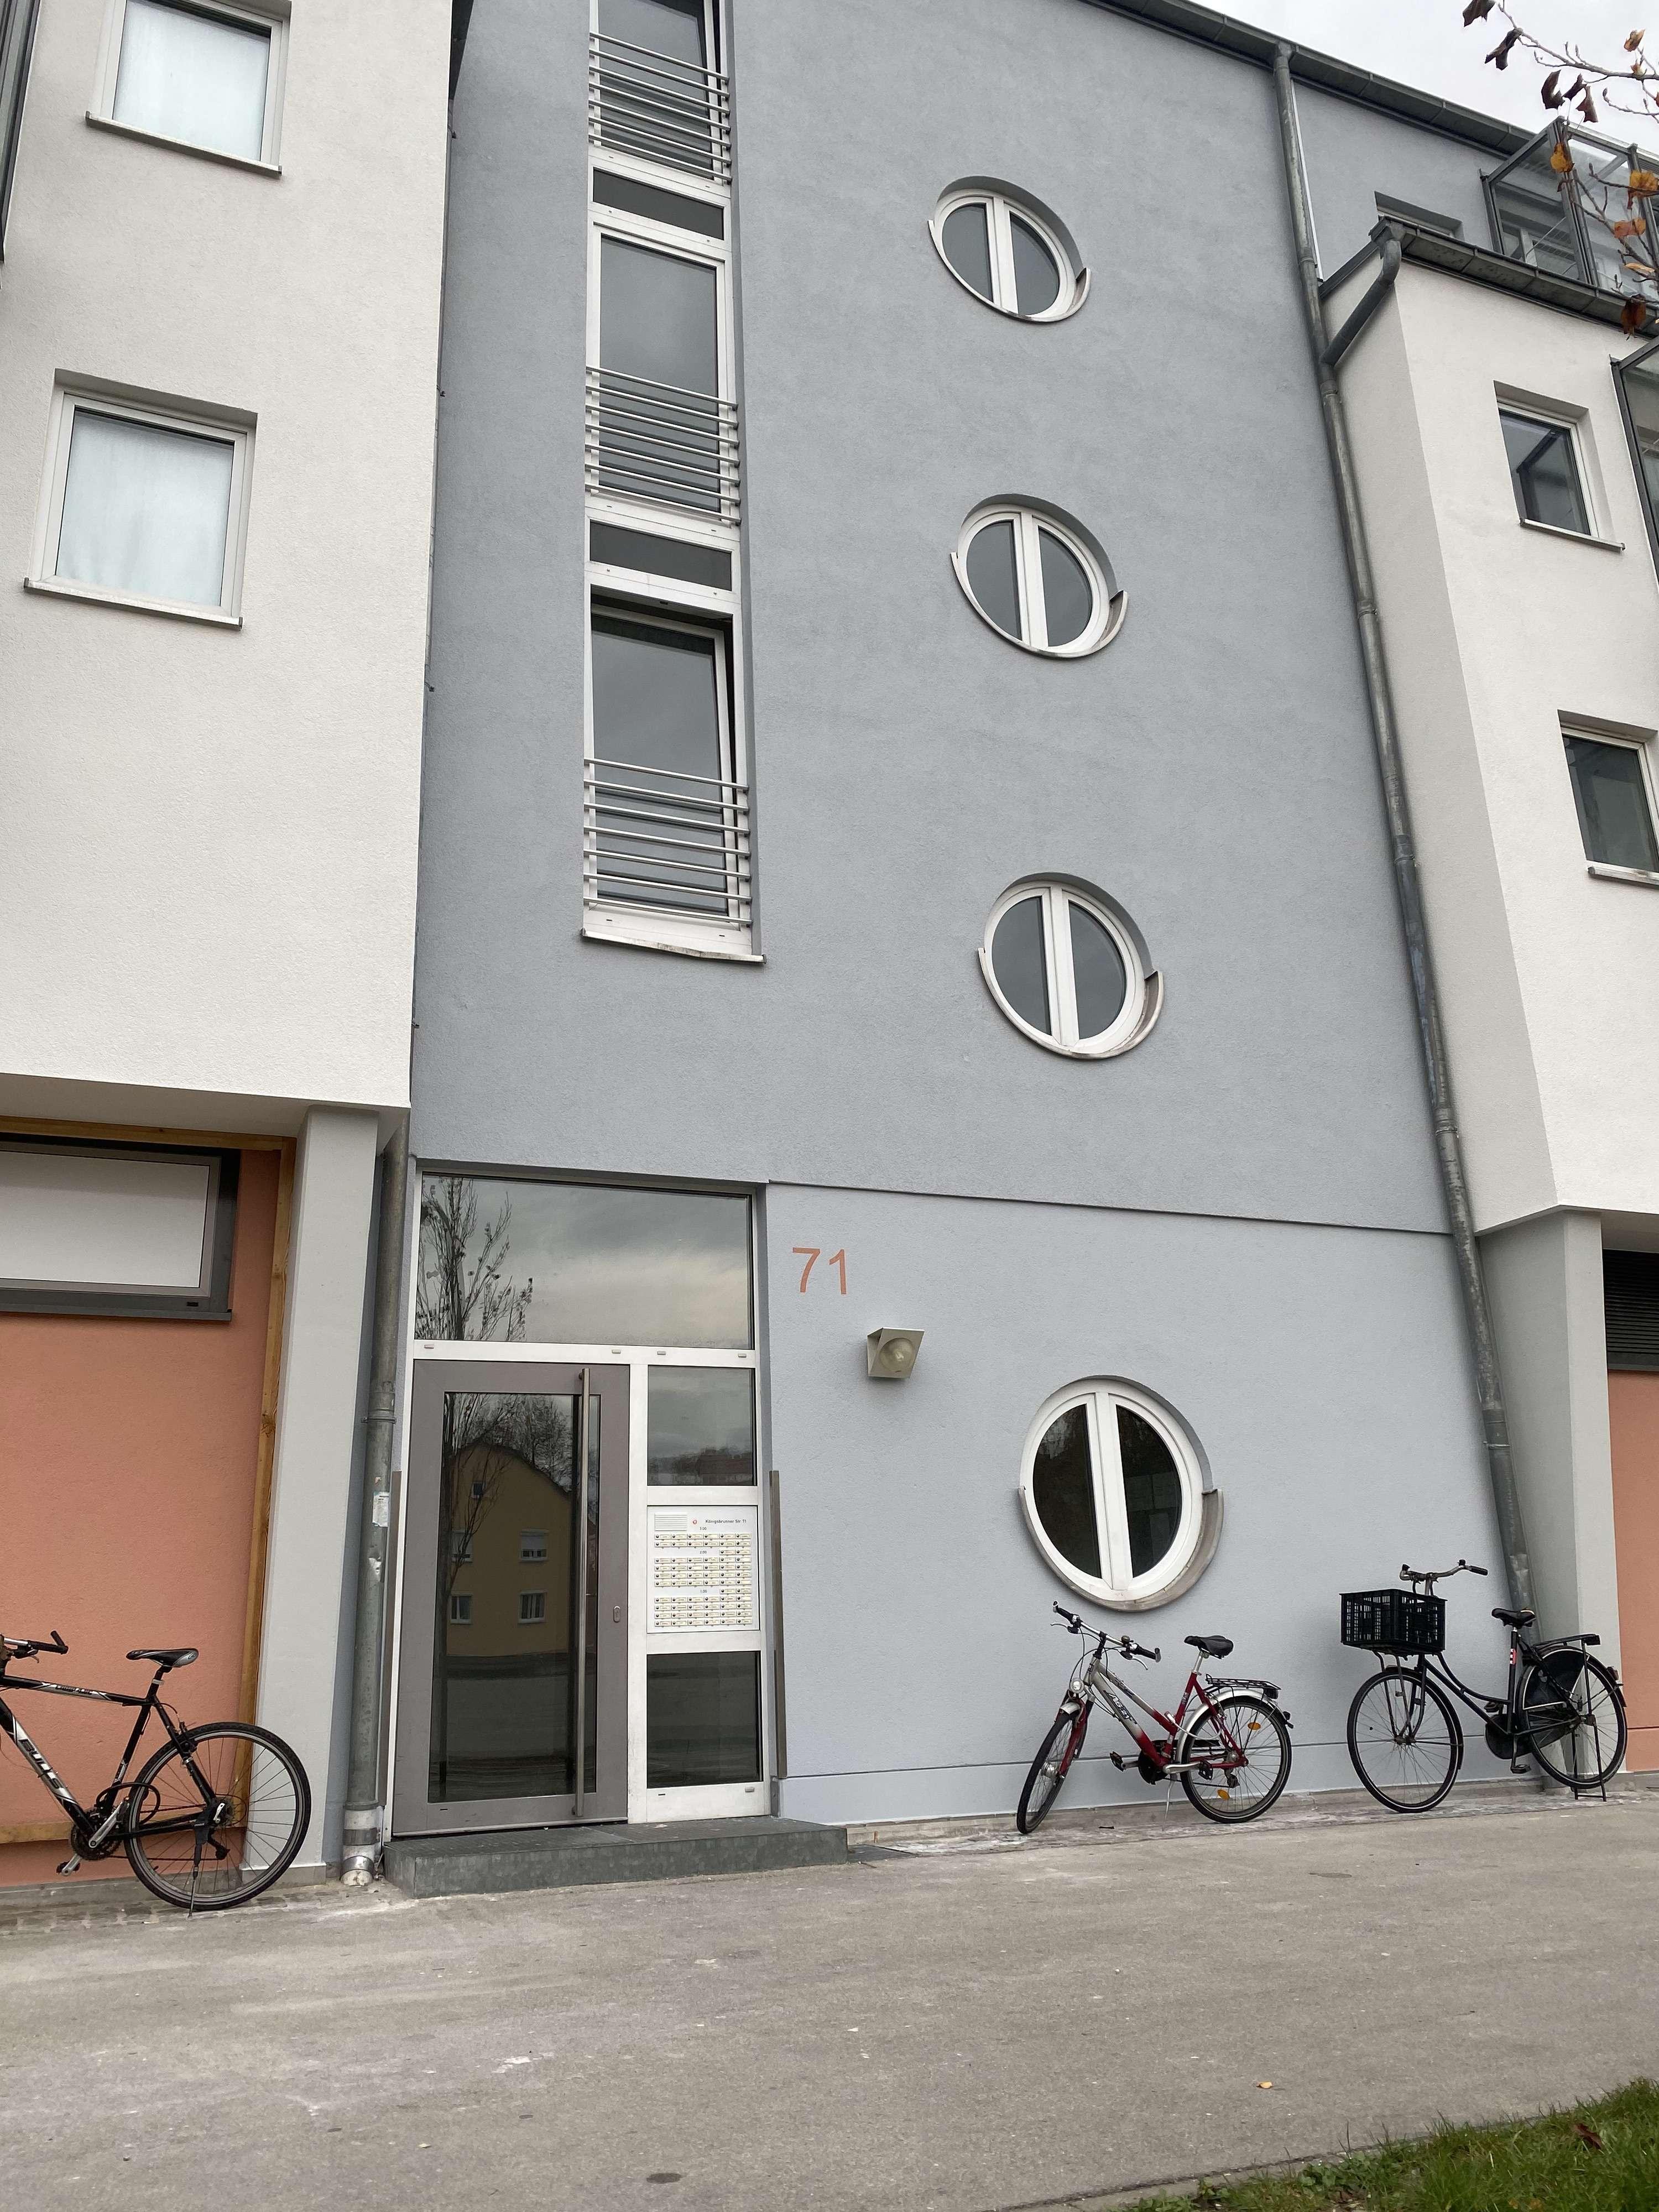 Komplett möbliertes Appartment in Haunstetten! in Haunstetten (Augsburg)